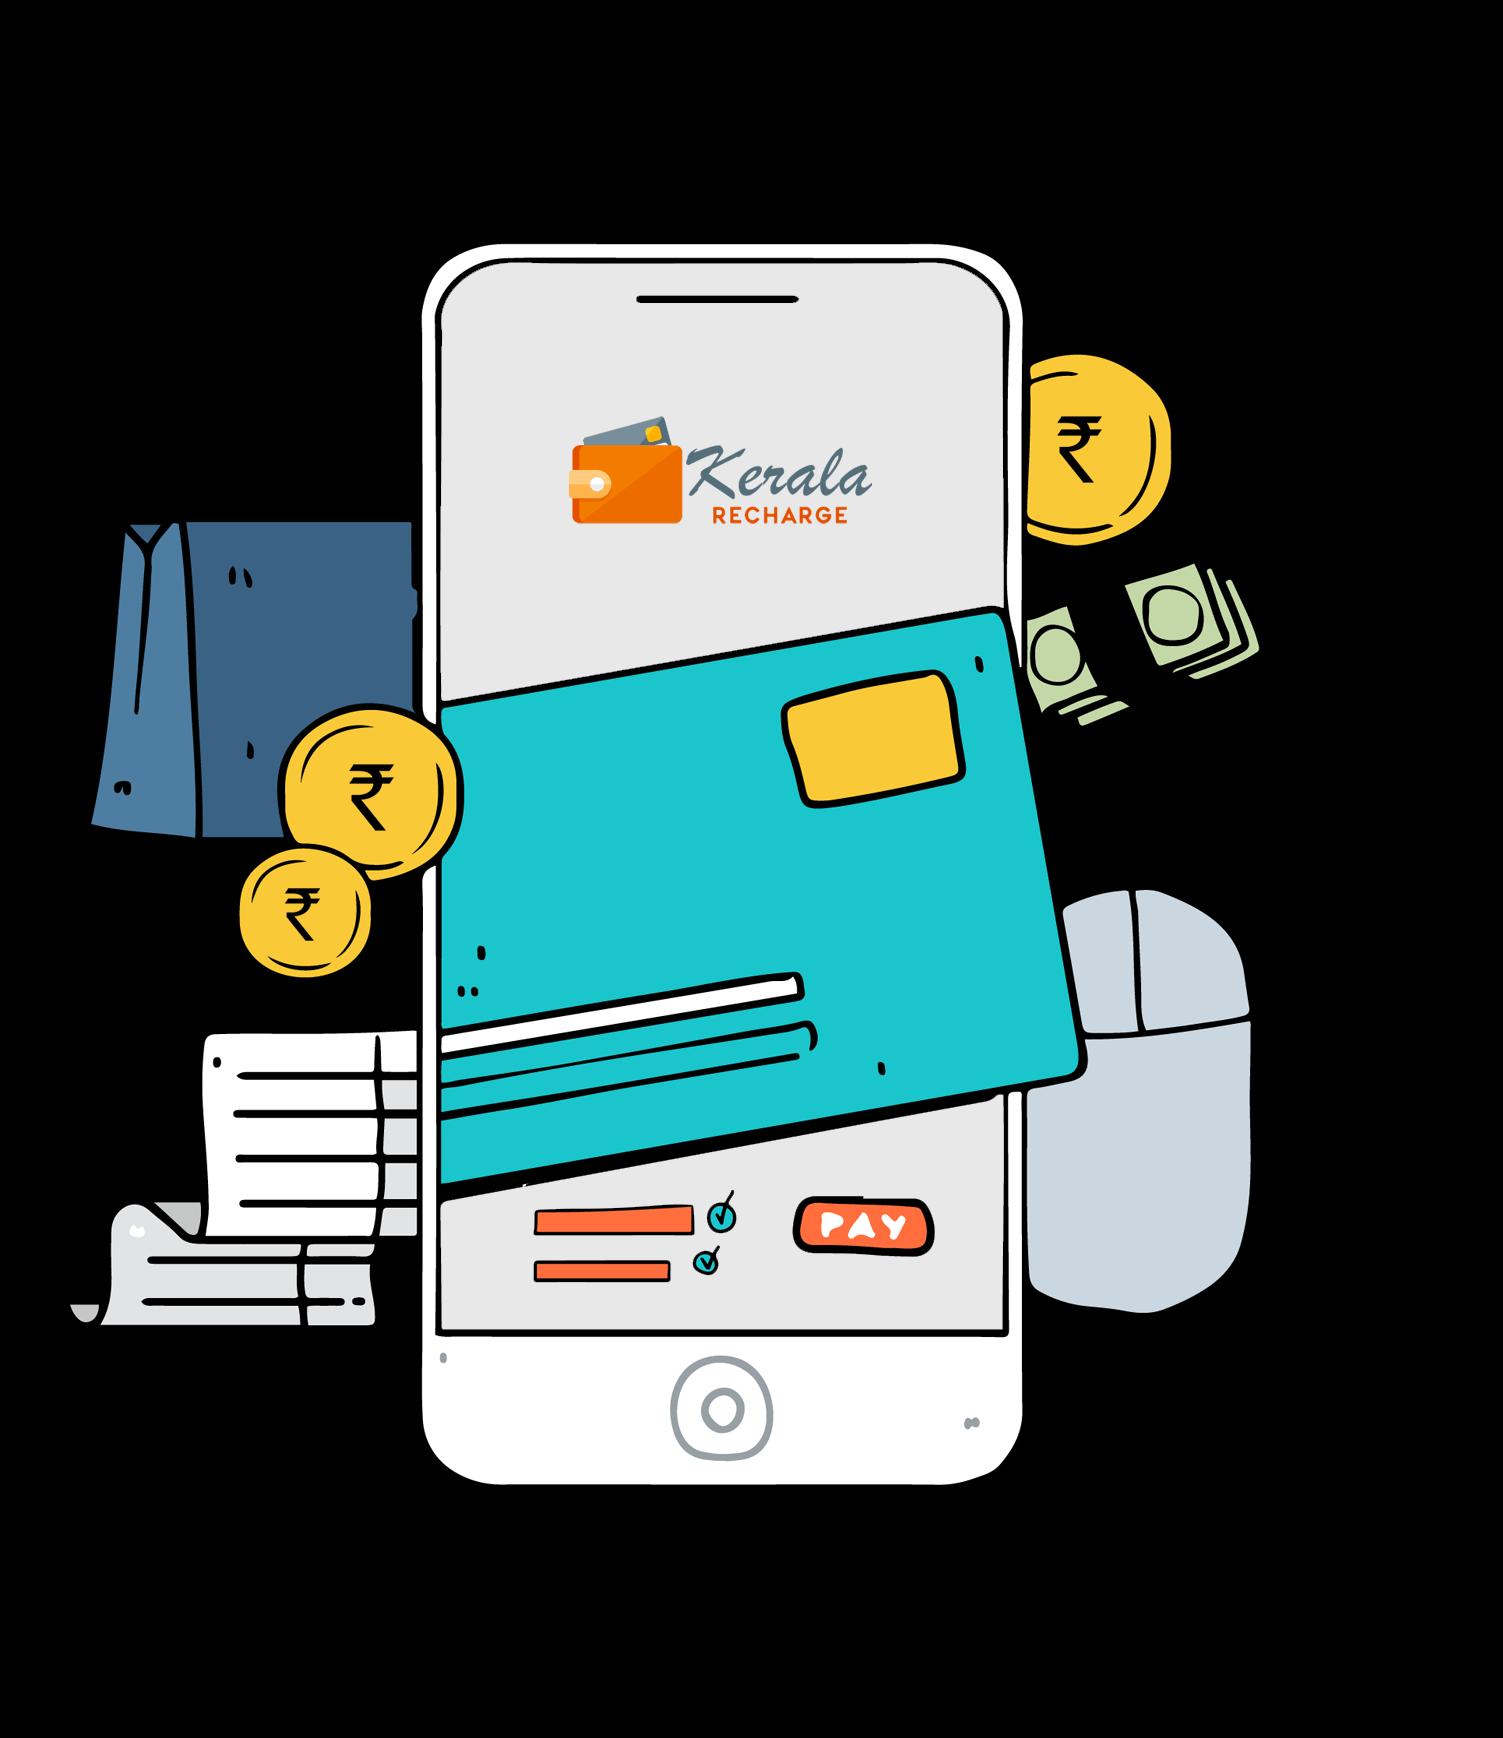 Kerala Recharge| Kerala mobile recharge online| mobile